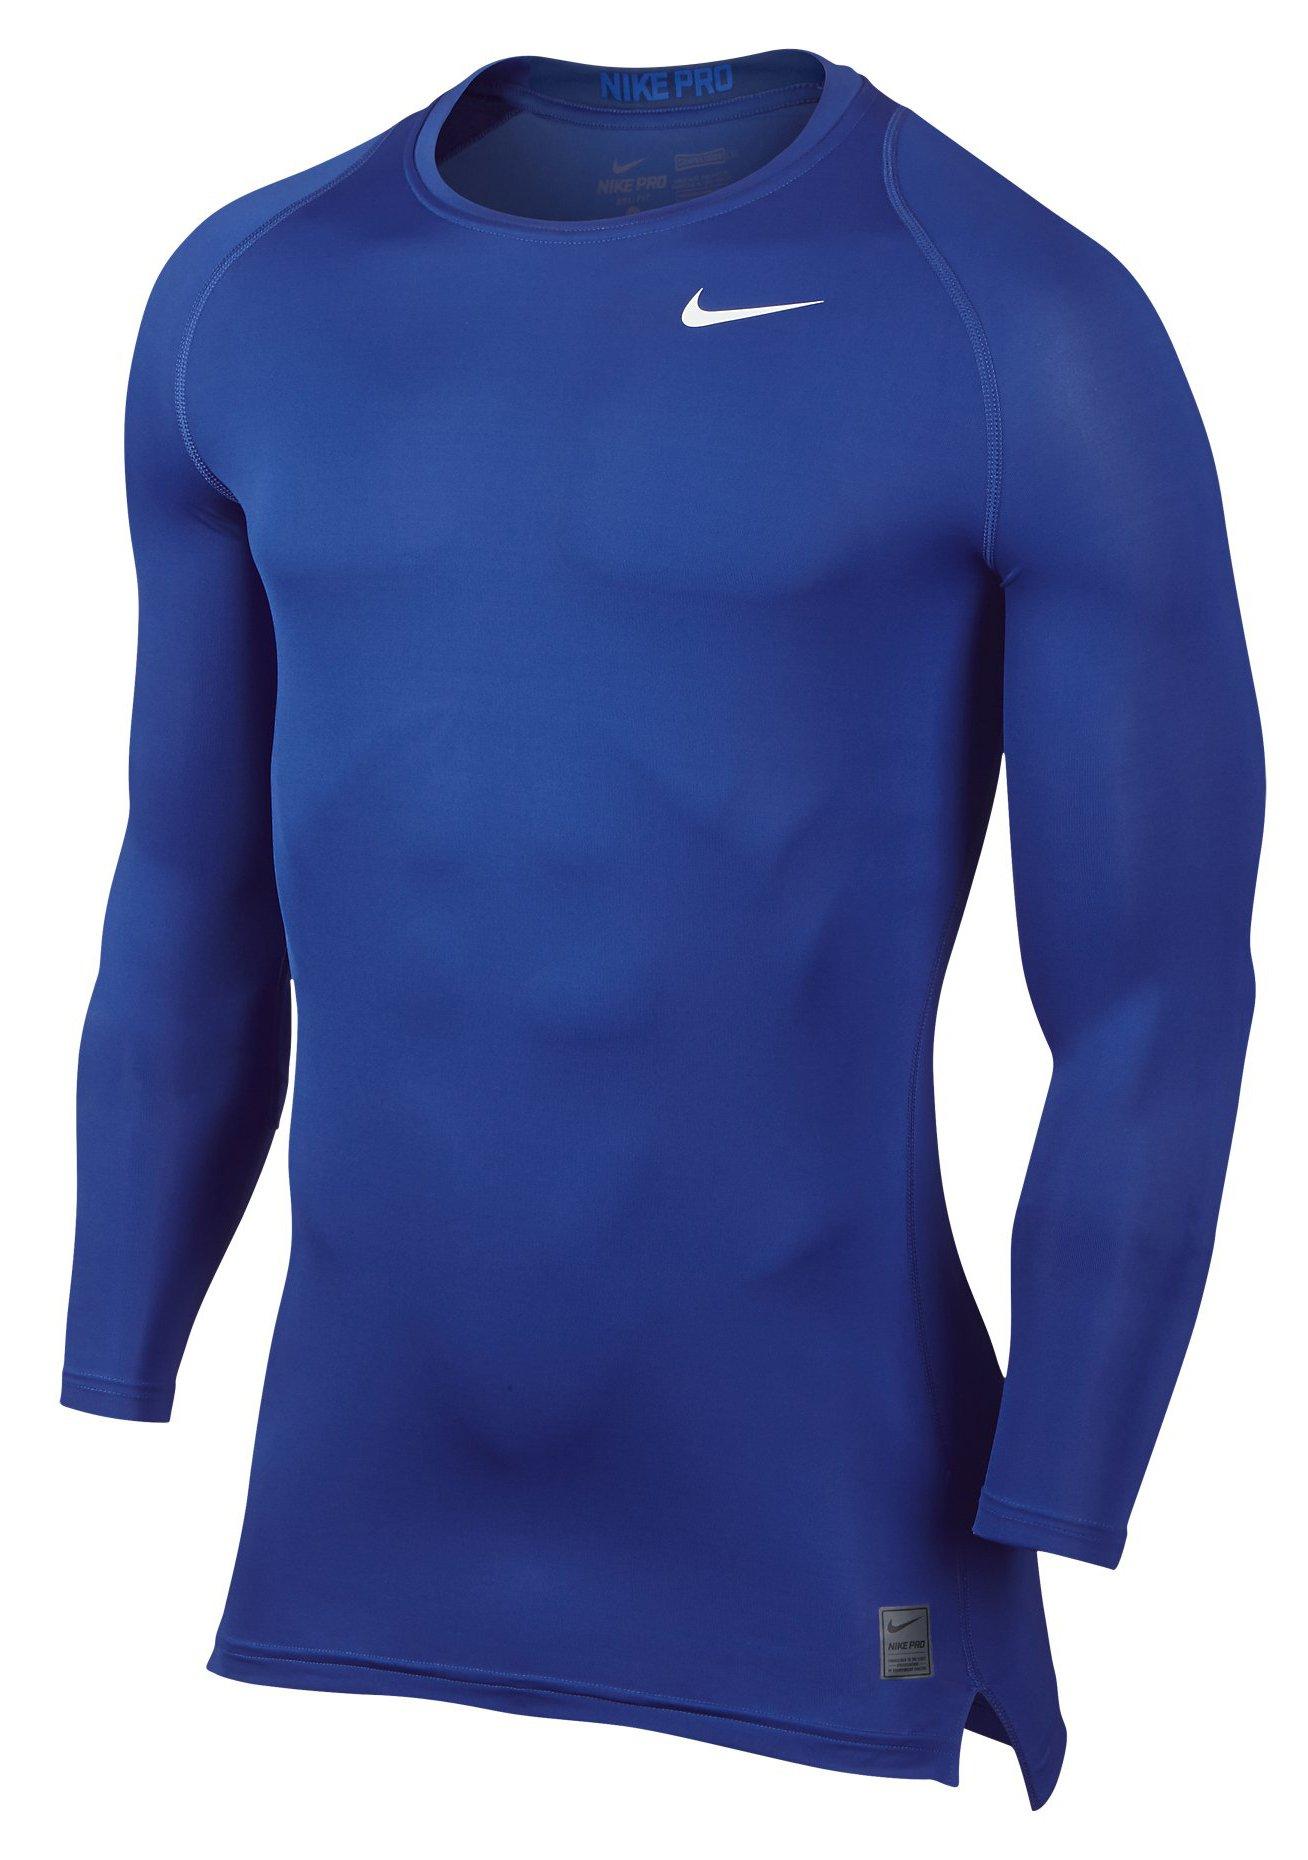 Kompresní triko Nike COOL COMP LS